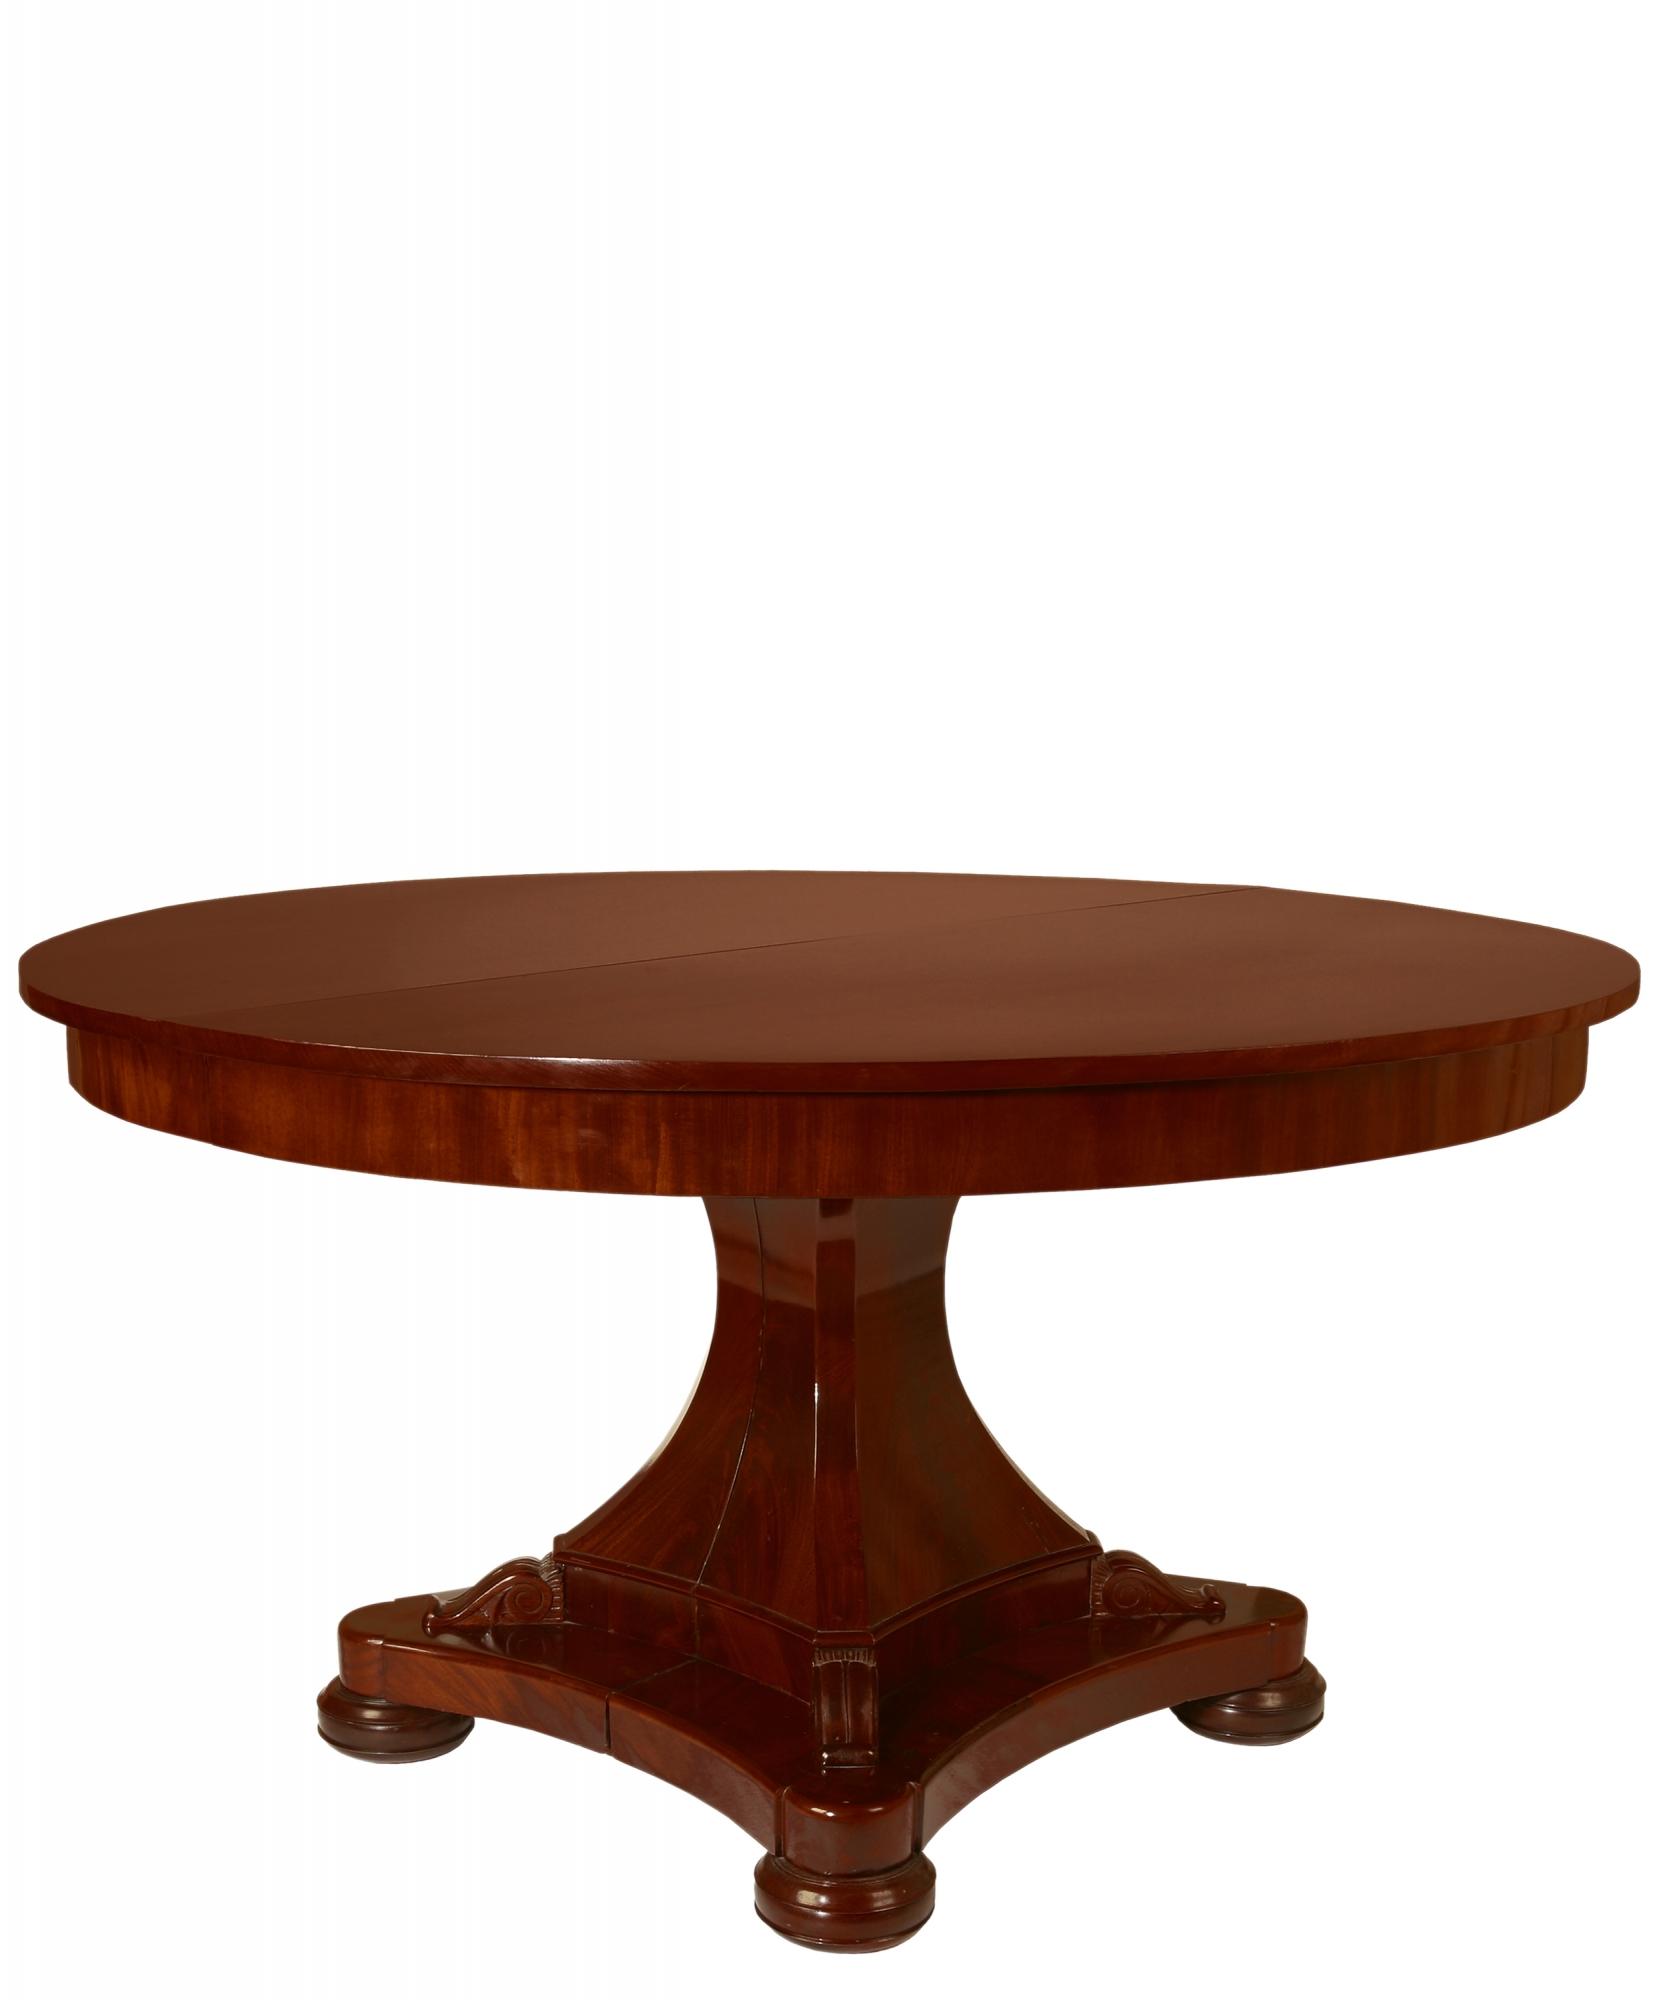 A Mahogany Empire Extending Dining Table